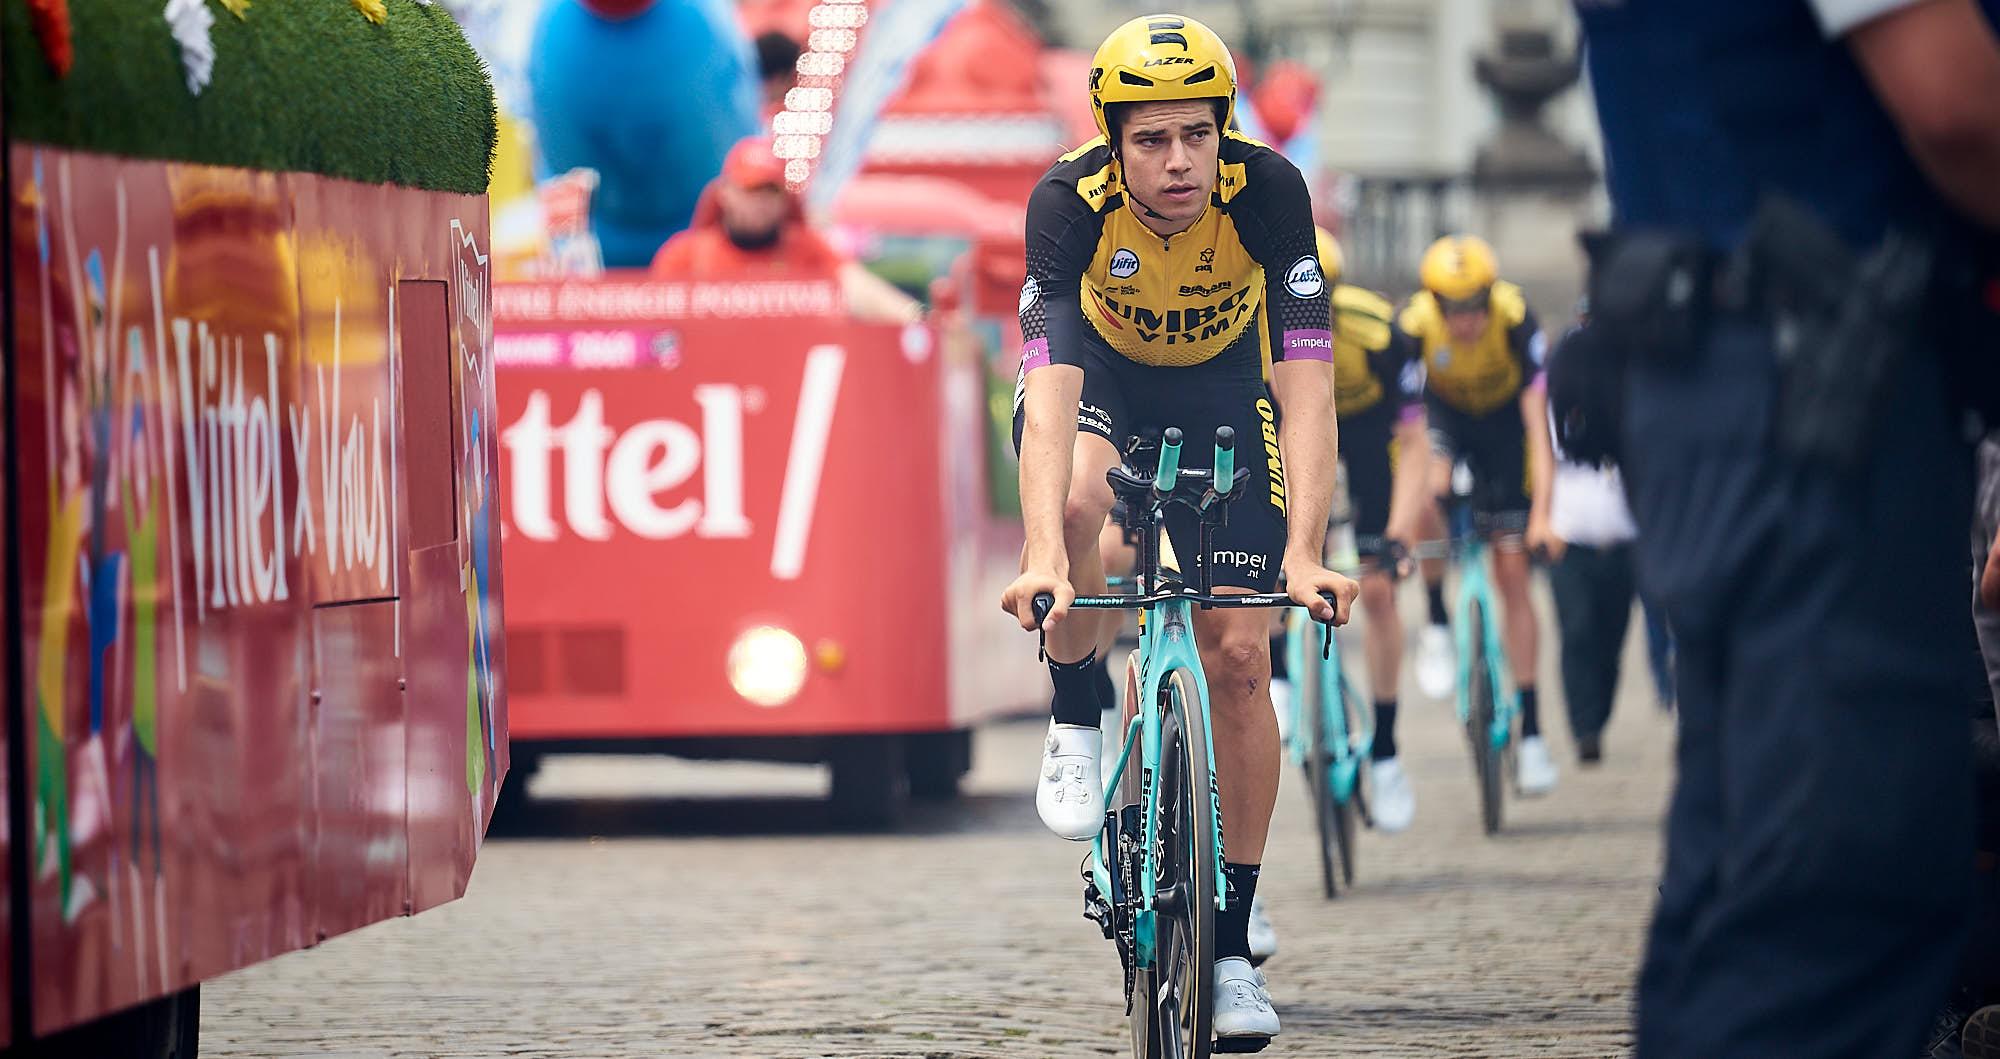 Jumbo-Visma's Wout van Aert on a TT bike in Brussels during the Tour de France